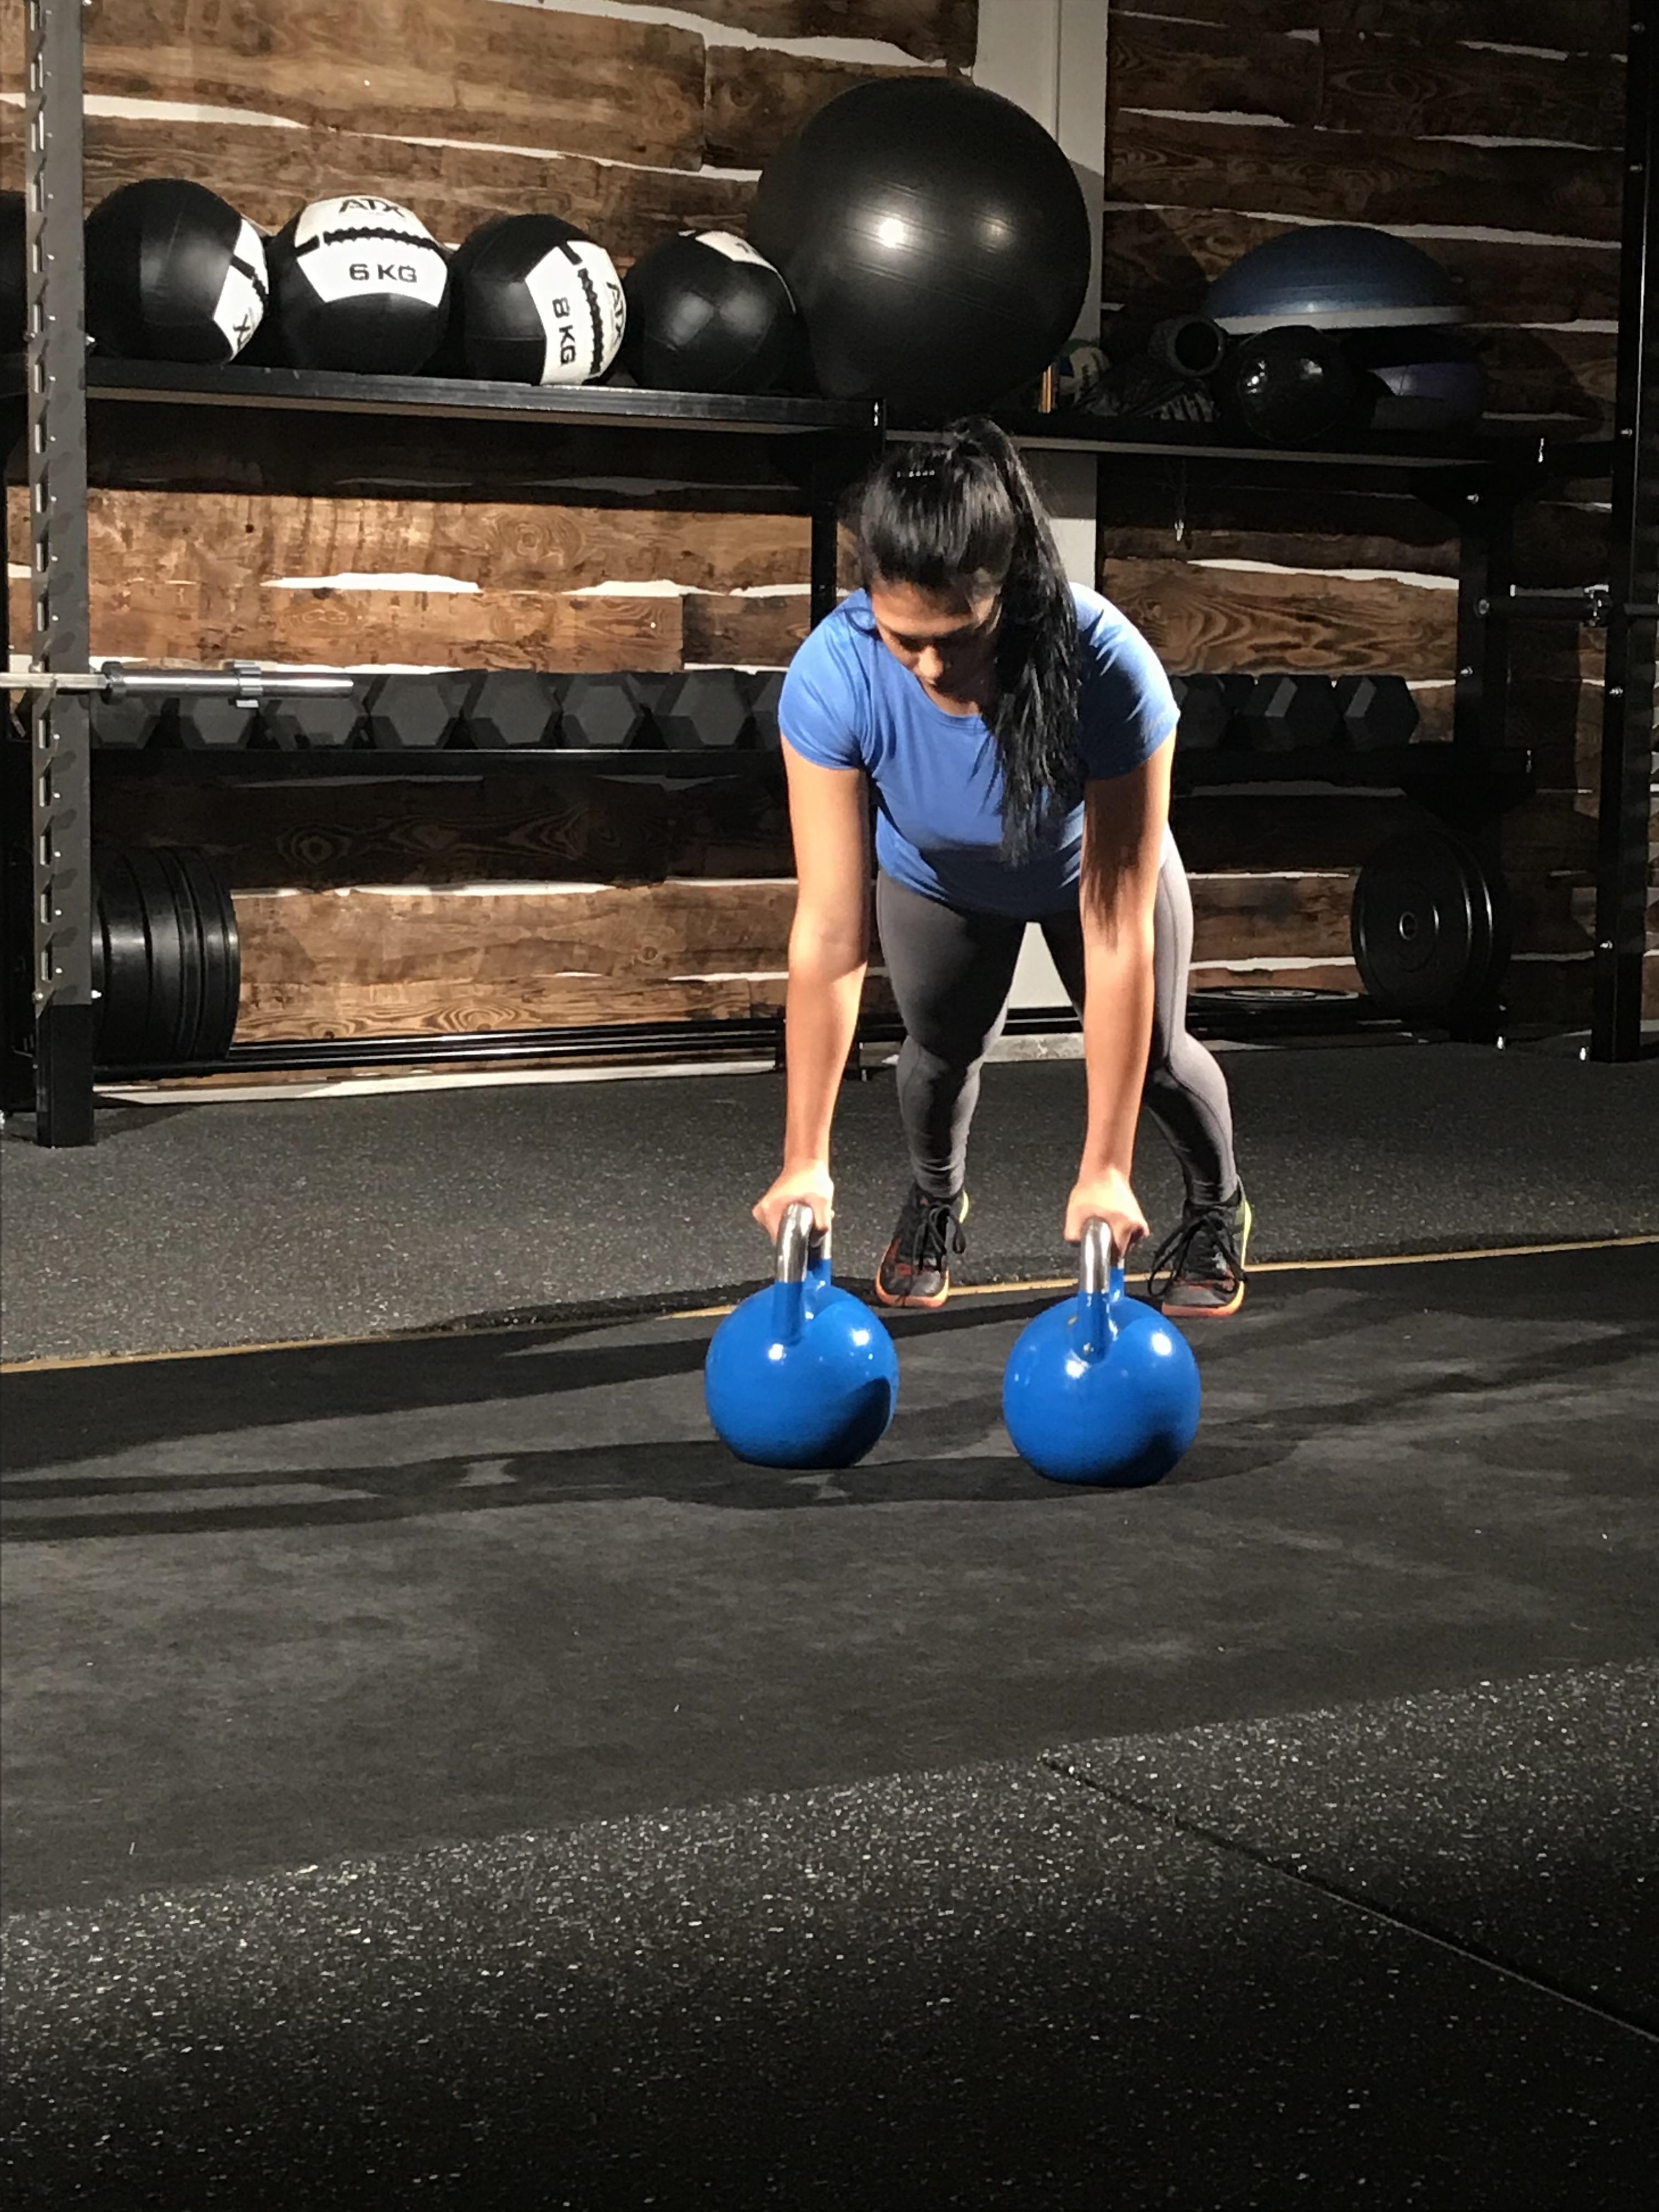 Chantal Düringer beim Fitnesstraining; Foto: ©Chantal Düringer